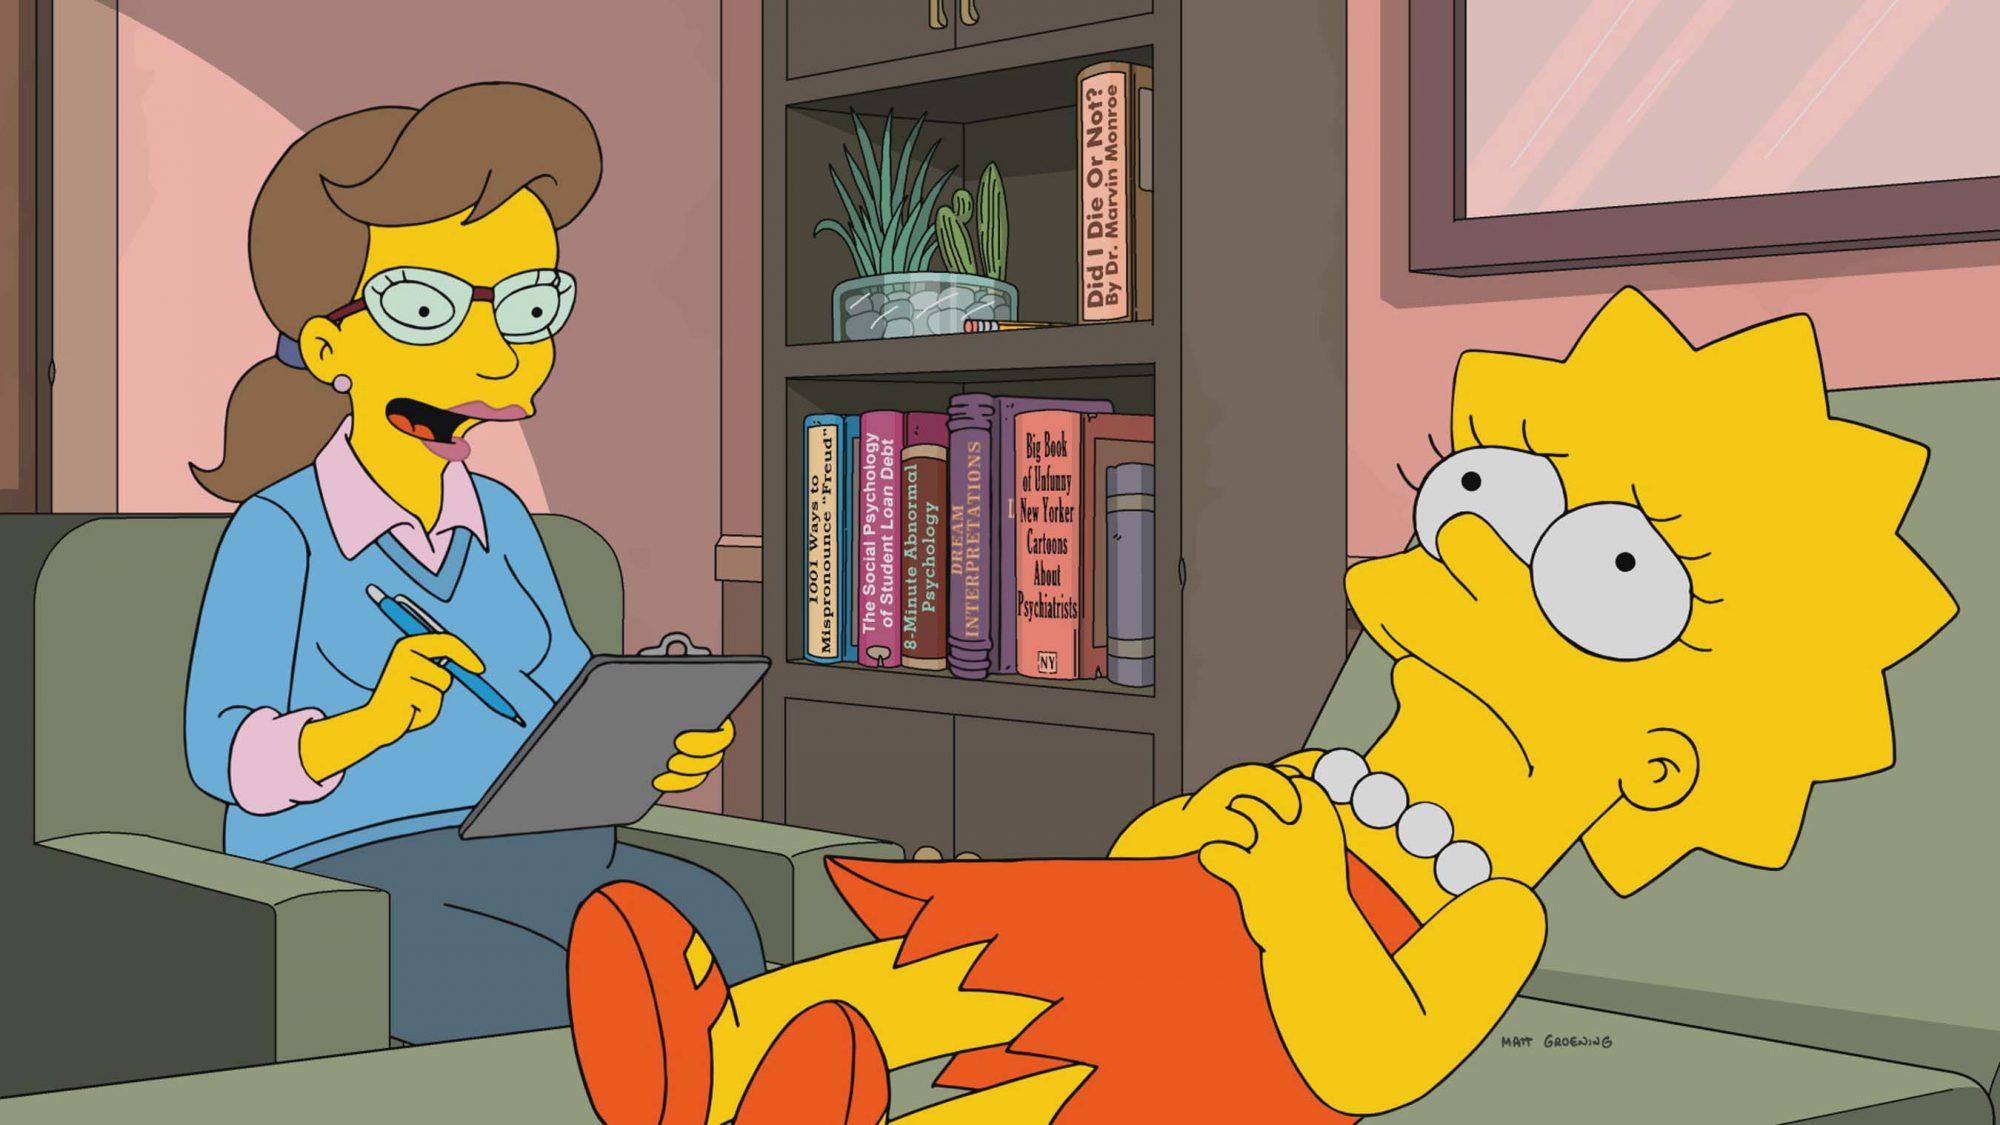 Simpsons_2822_SpringfieldSplendor_Sc_1047_Avid_Color_Corrected